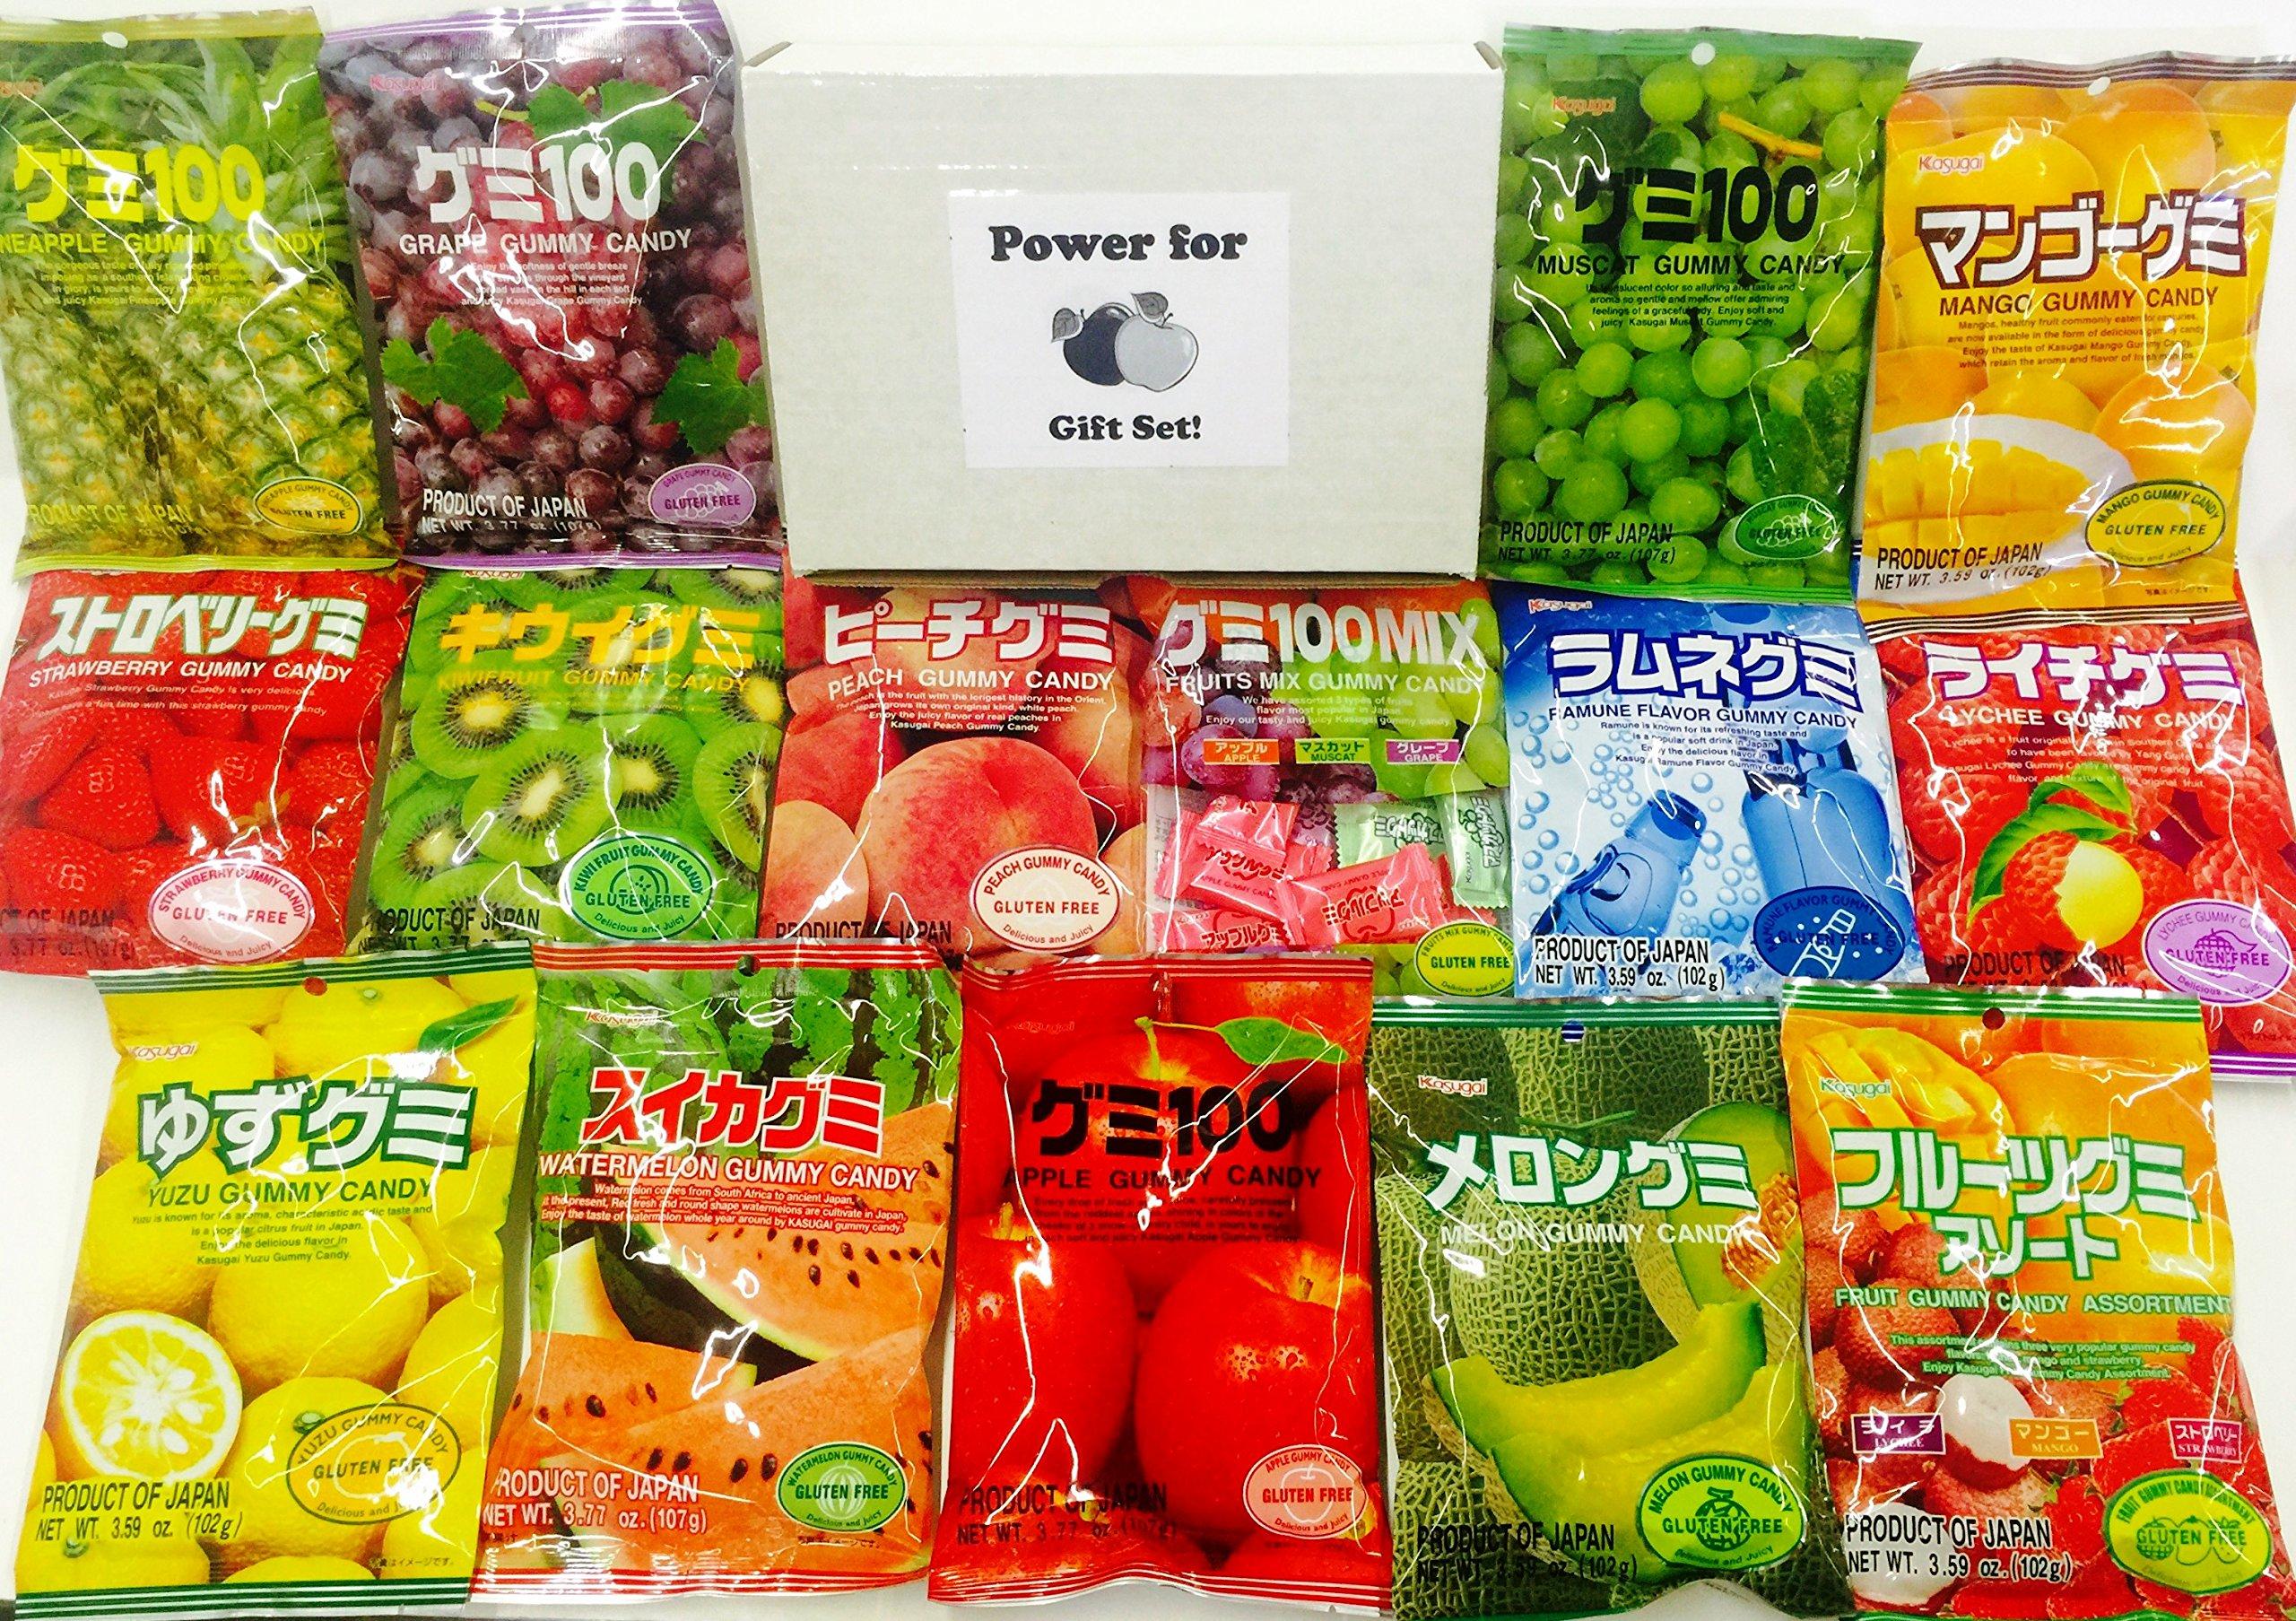 Kasugai Gummy Party Pack 15x3.59oz (15 Bags At least 12 Flavors), Lychee, Mango, Peach, Strawberry, Grape, Kiwi, Melon, Pinapple, Apple, Watermelon, Lemon, Ramune, and More! by Kasugai